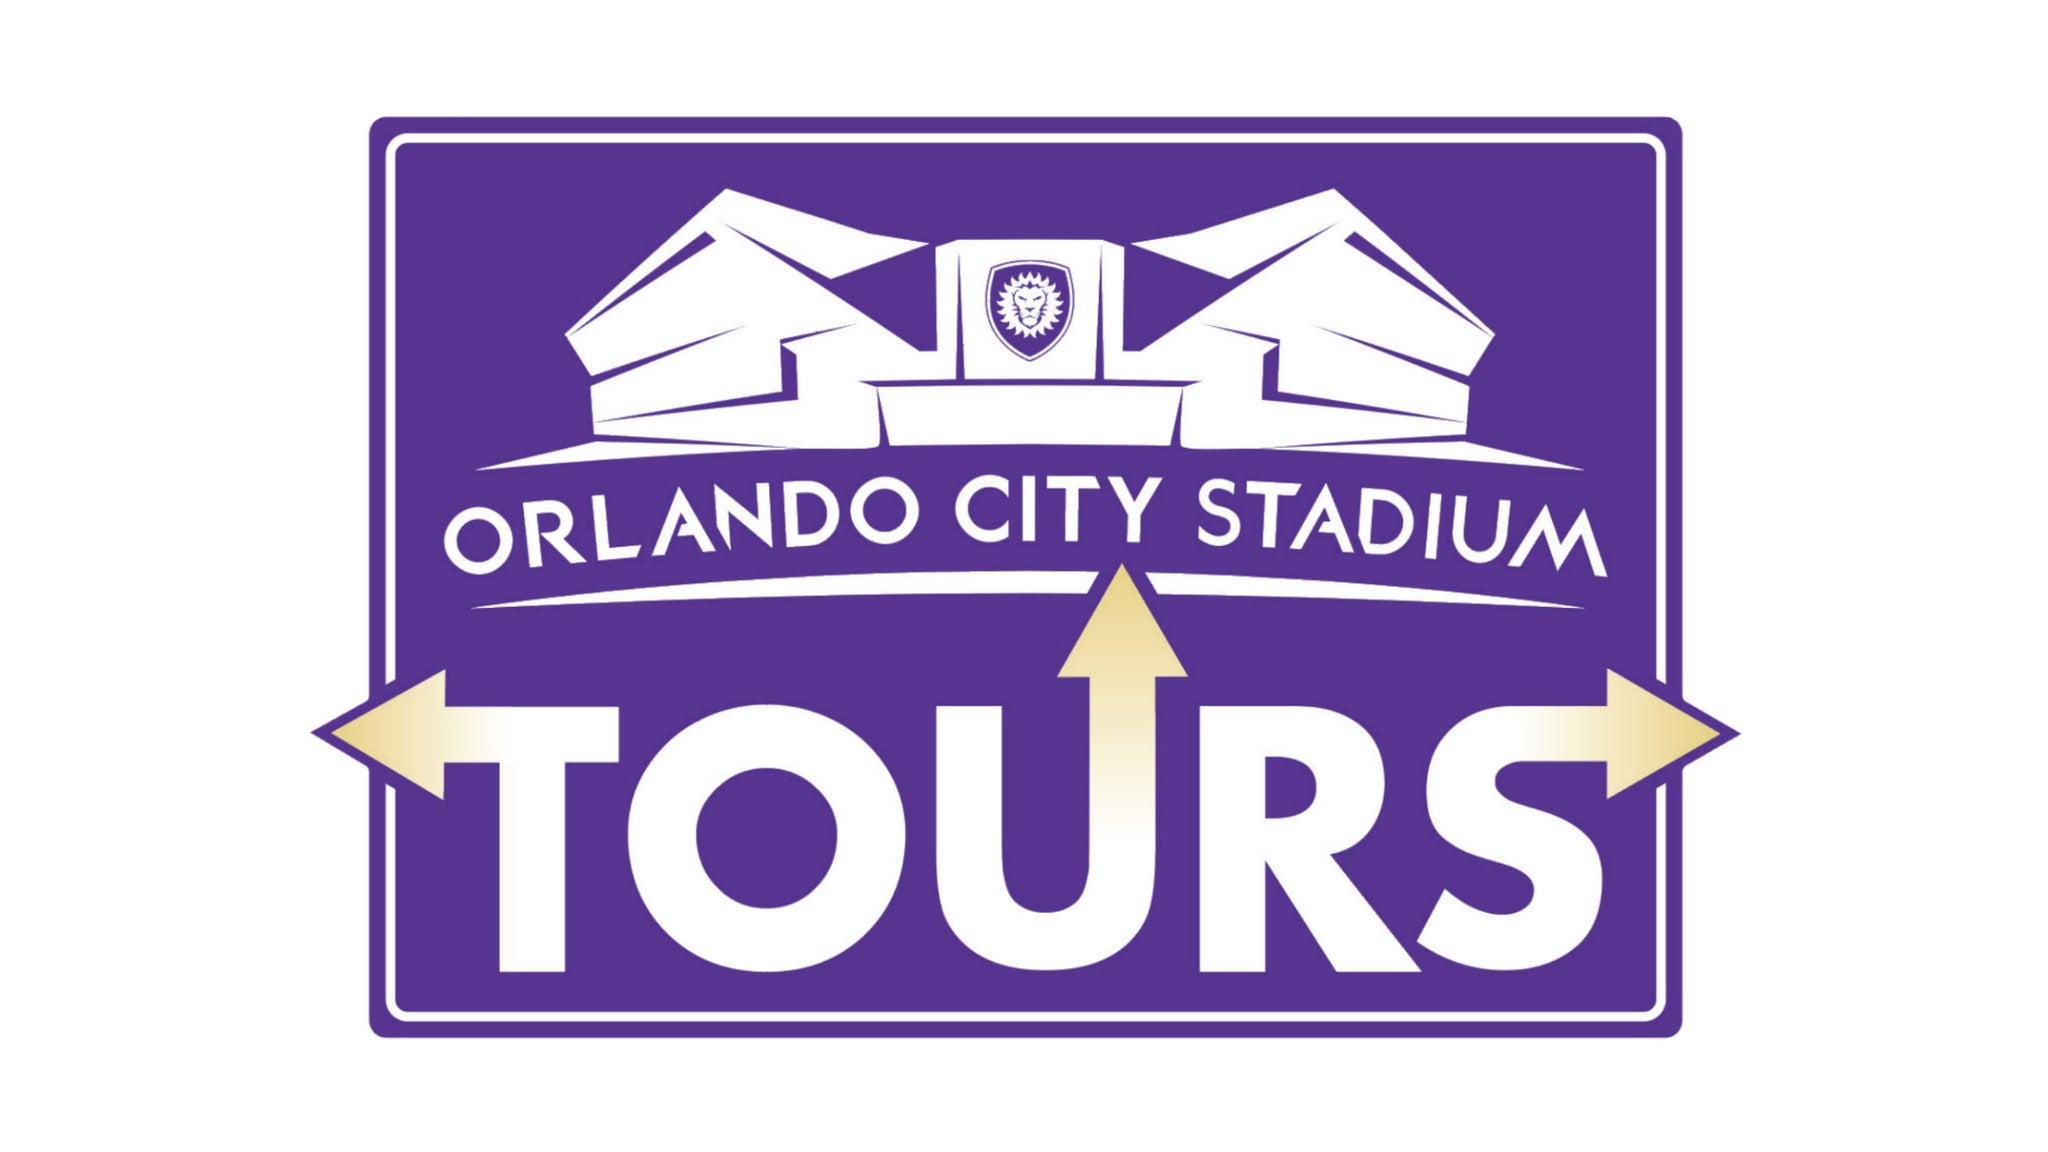 Orlando City Stadium Tour